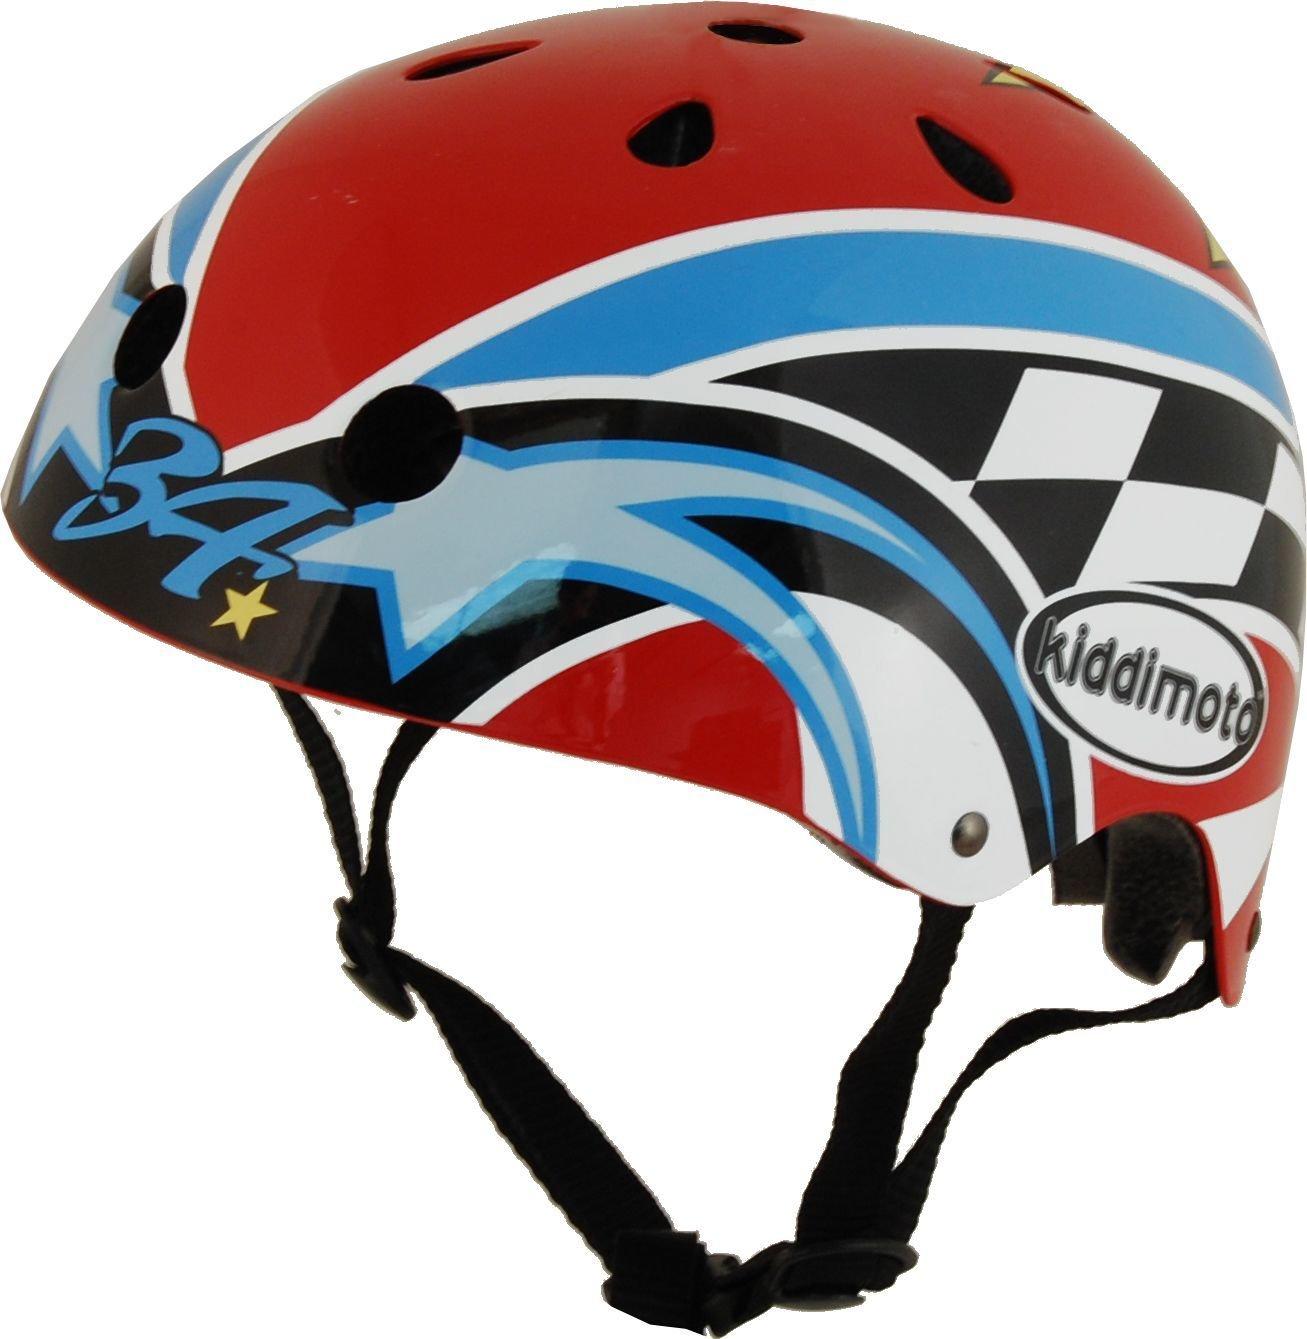 Multicoloured 48-52cm cm Kiddimoto Mens Small Hero Kinder Kevin Schwantz Helmet